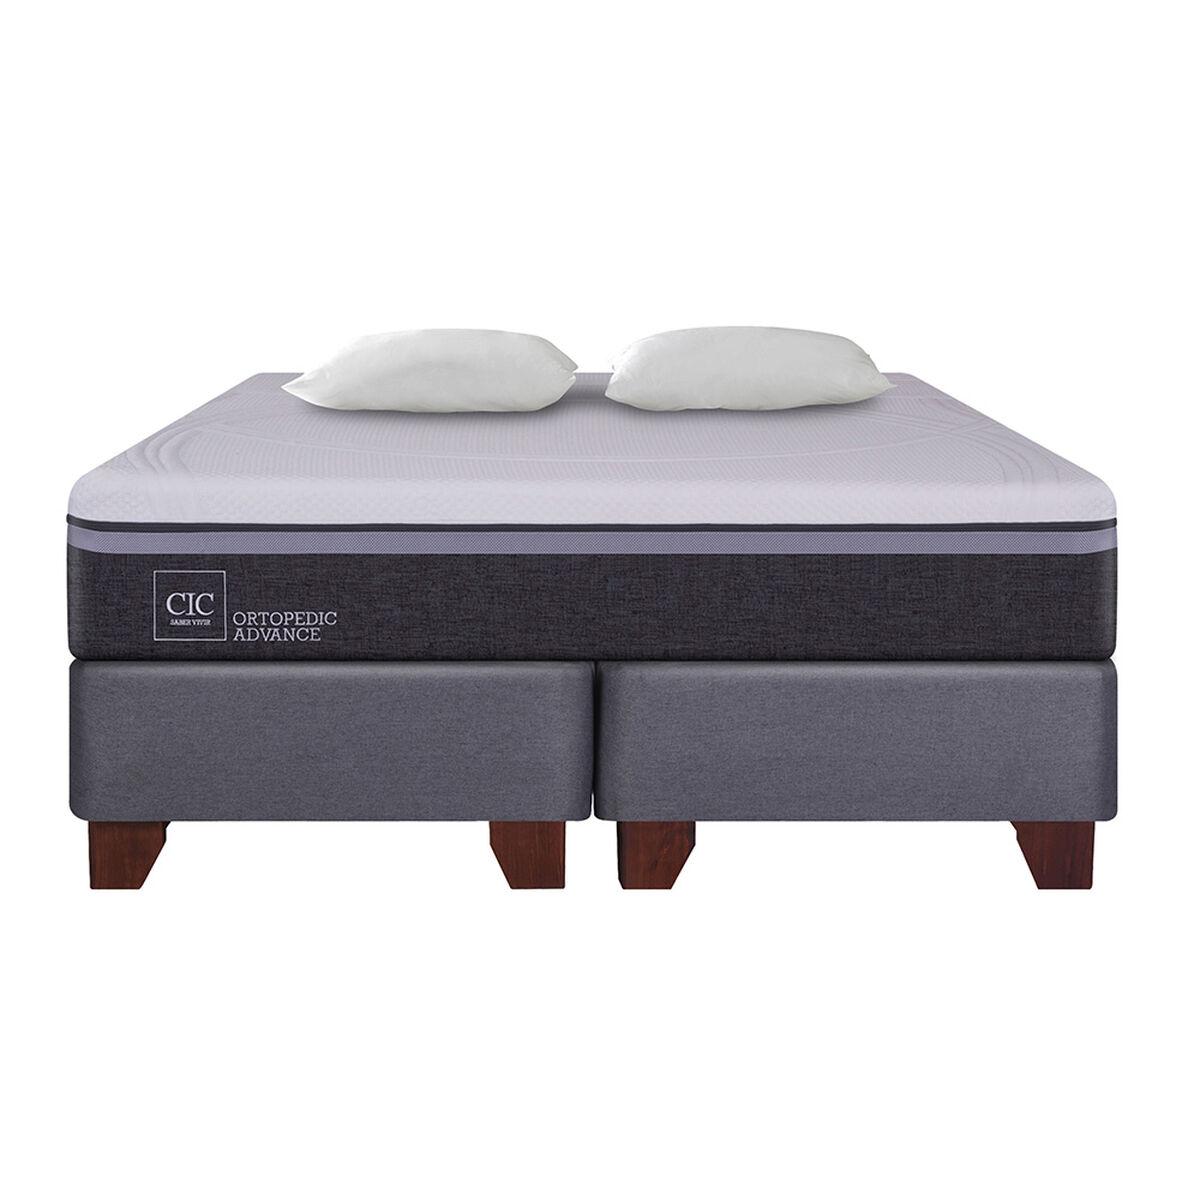 Box Spring 2 Plazas Div Ortopedic Advance + Almohadas